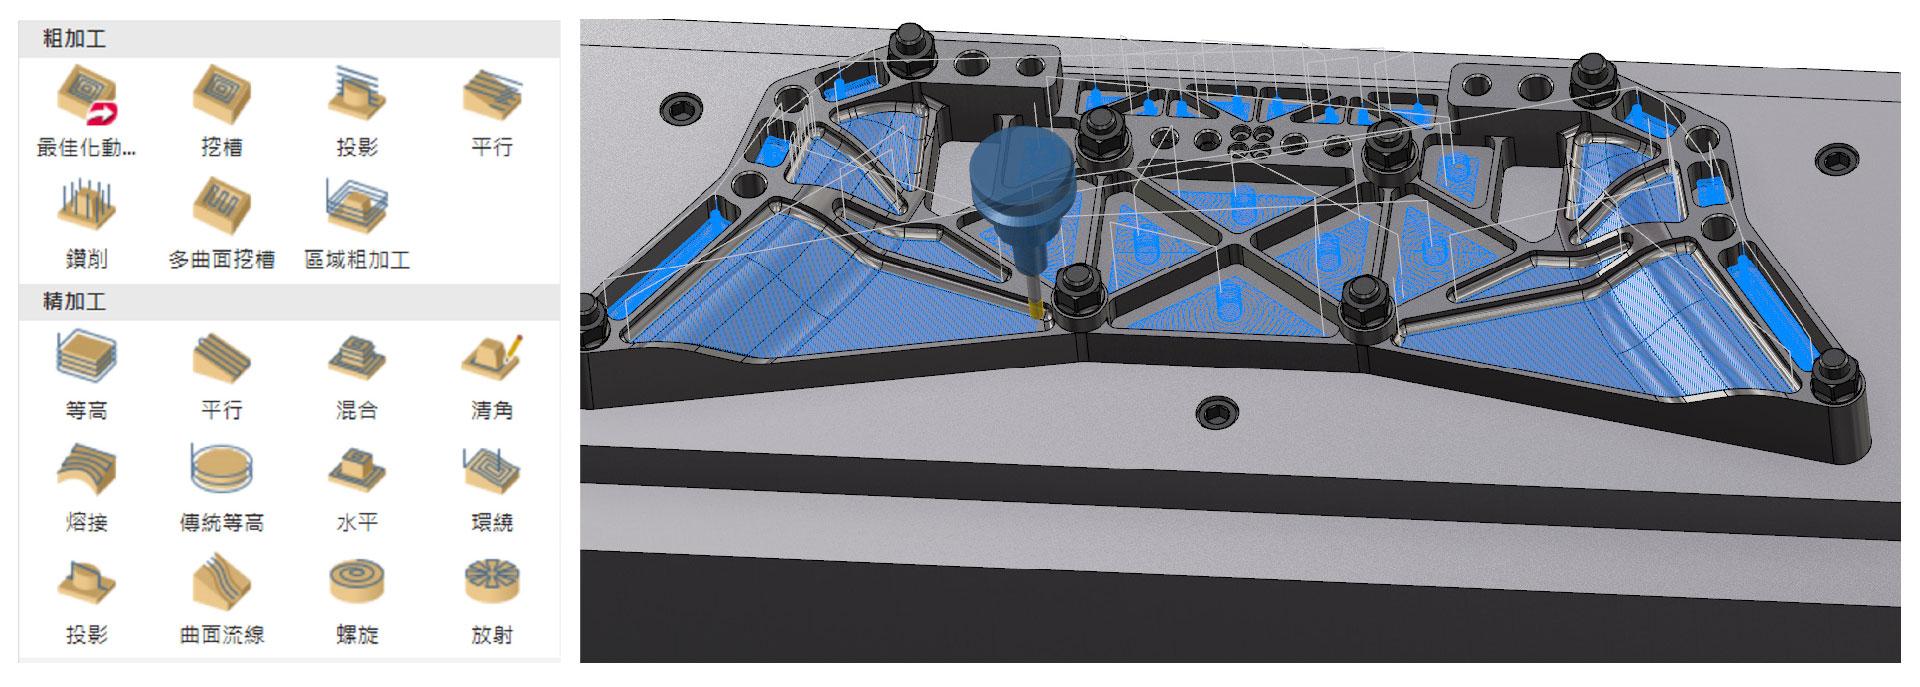 Mastercam-3D-銑床加工